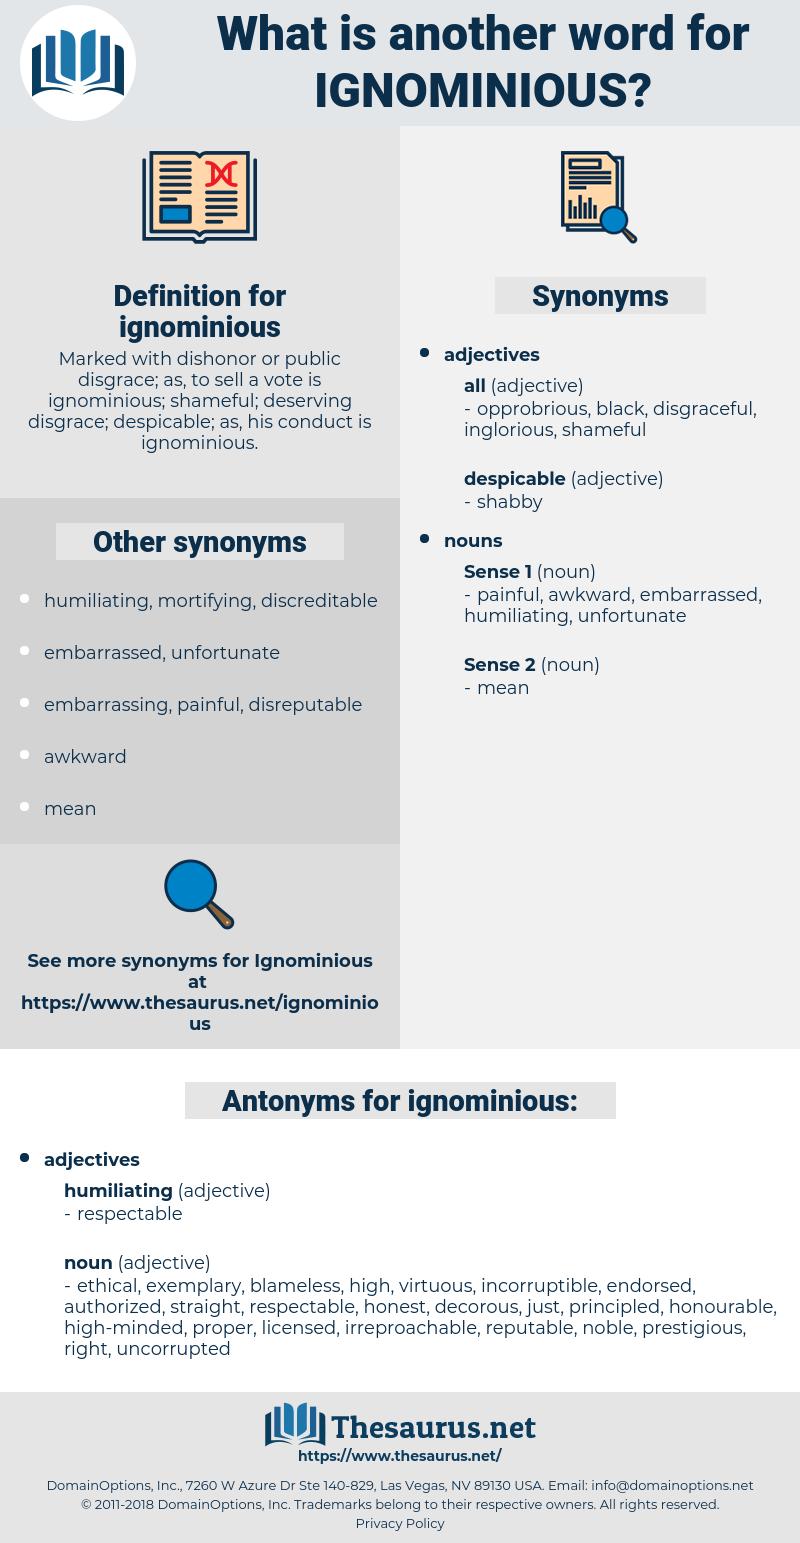 ignominious, synonym ignominious, another word for ignominious, words like ignominious, thesaurus ignominious